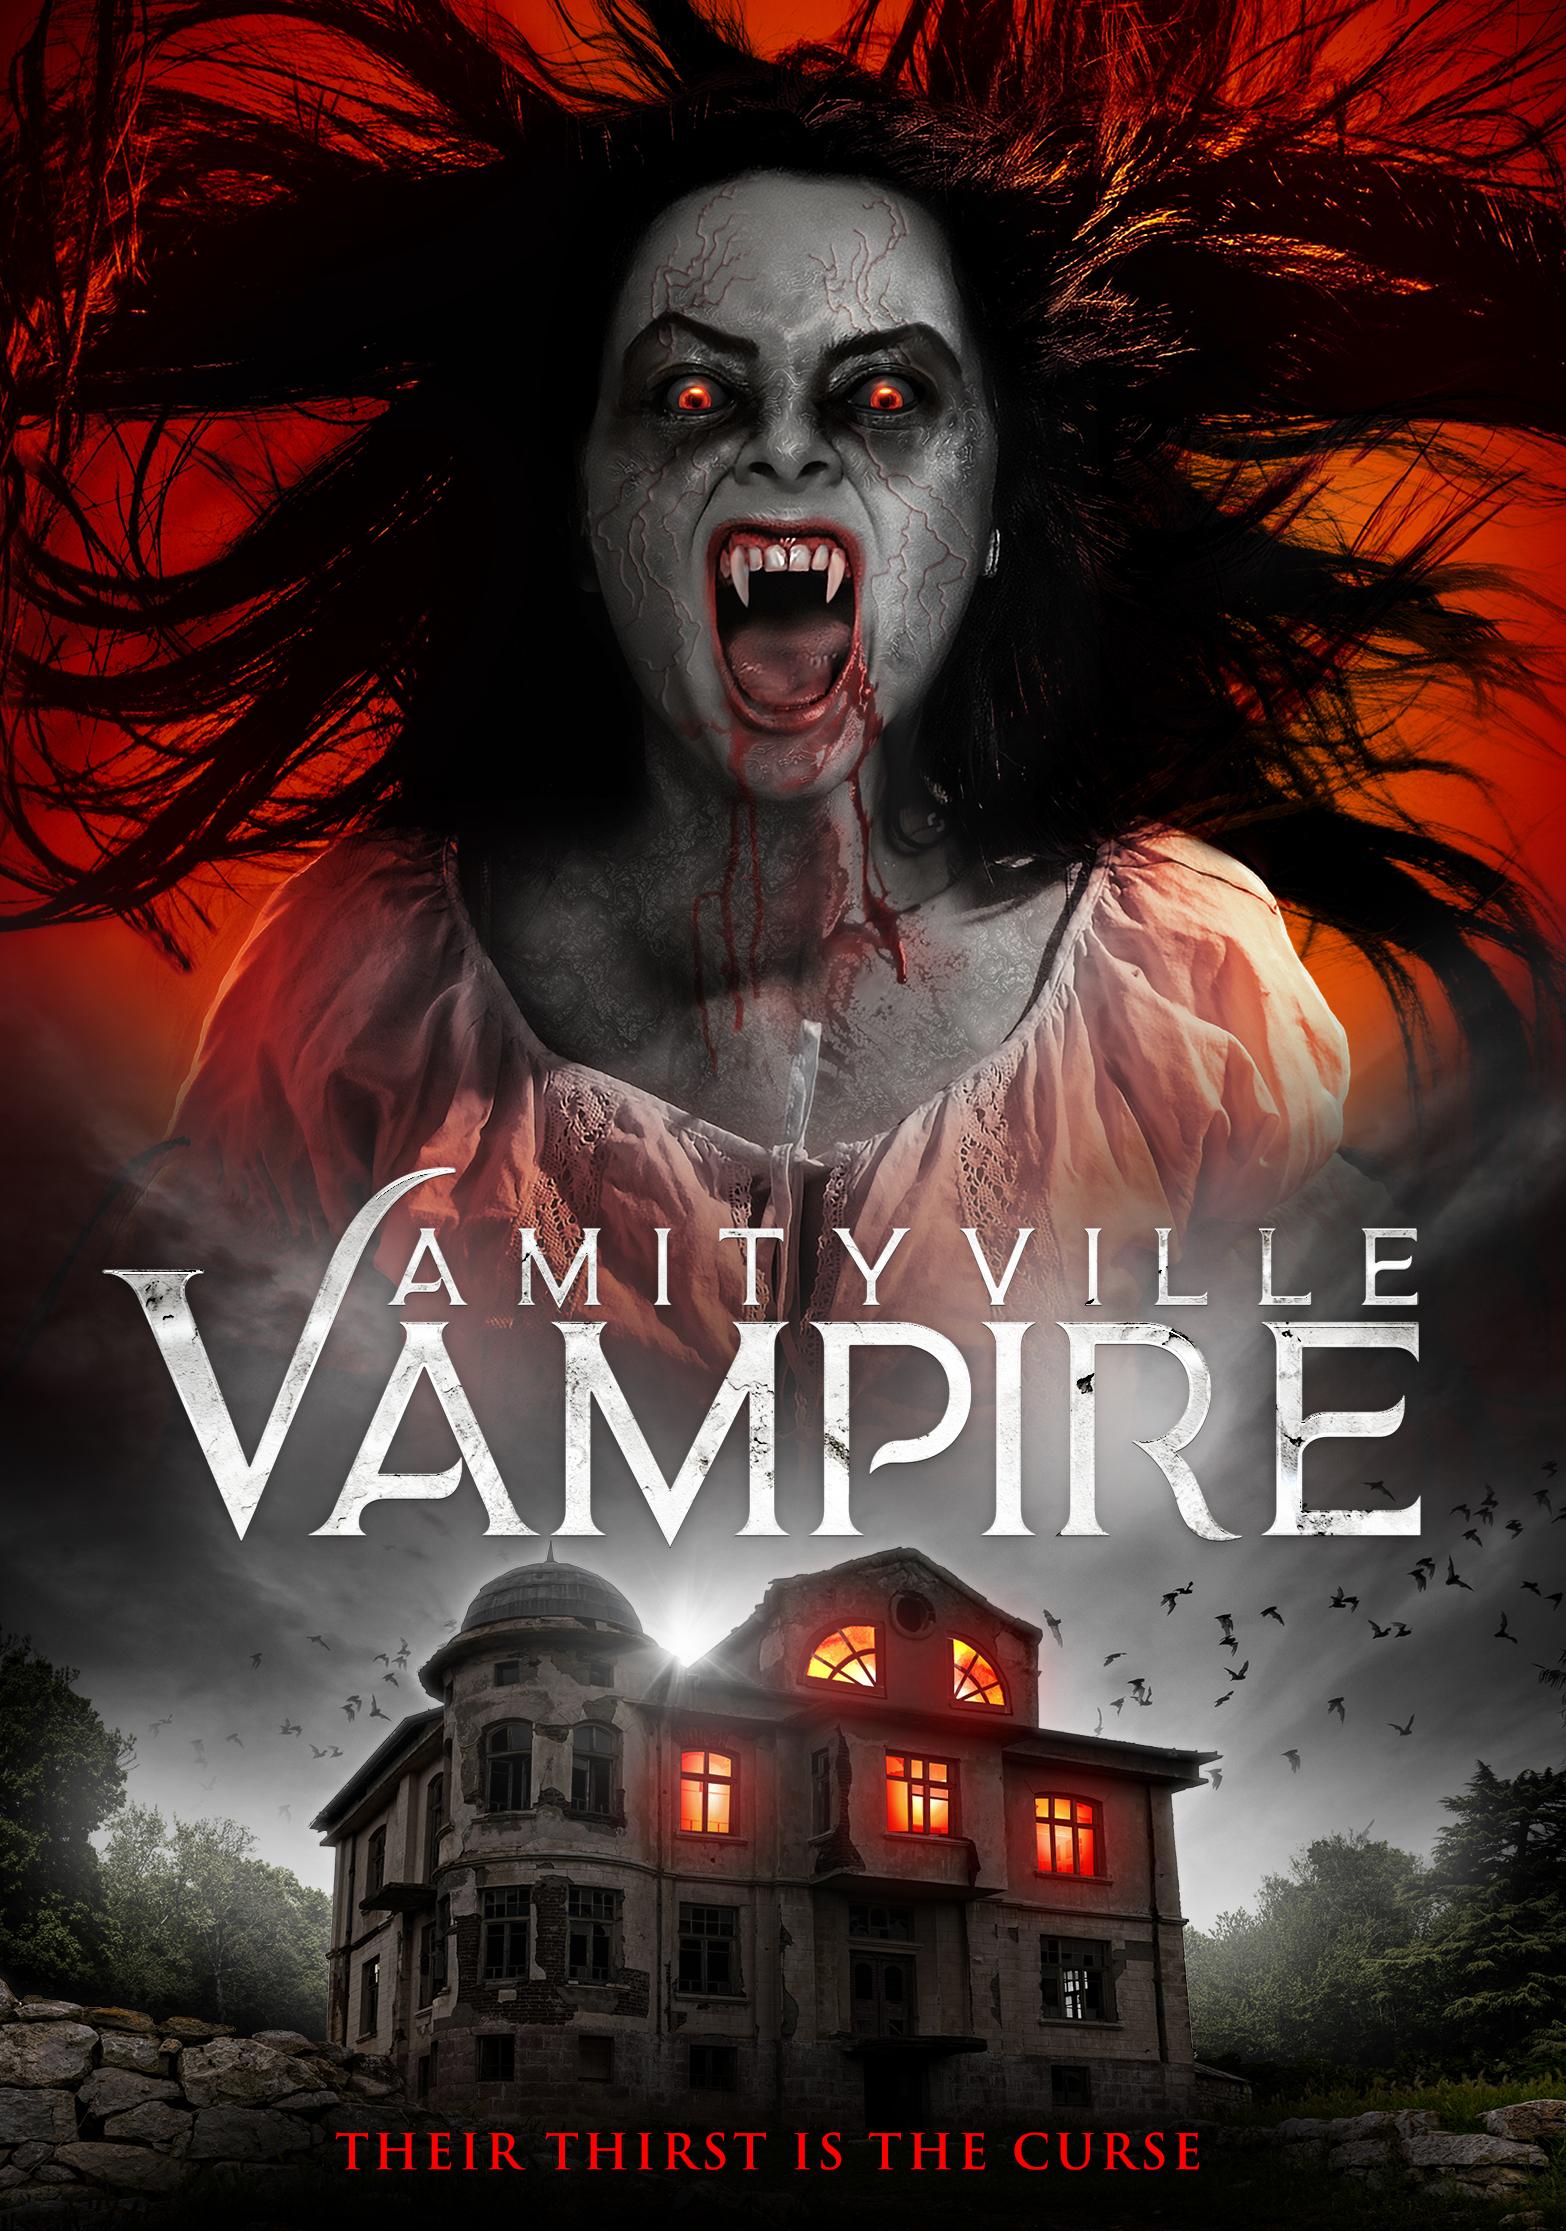 Amityville Vampire (2021) Dual Audio 720p WEBRip [Hindi + English] Full Movie